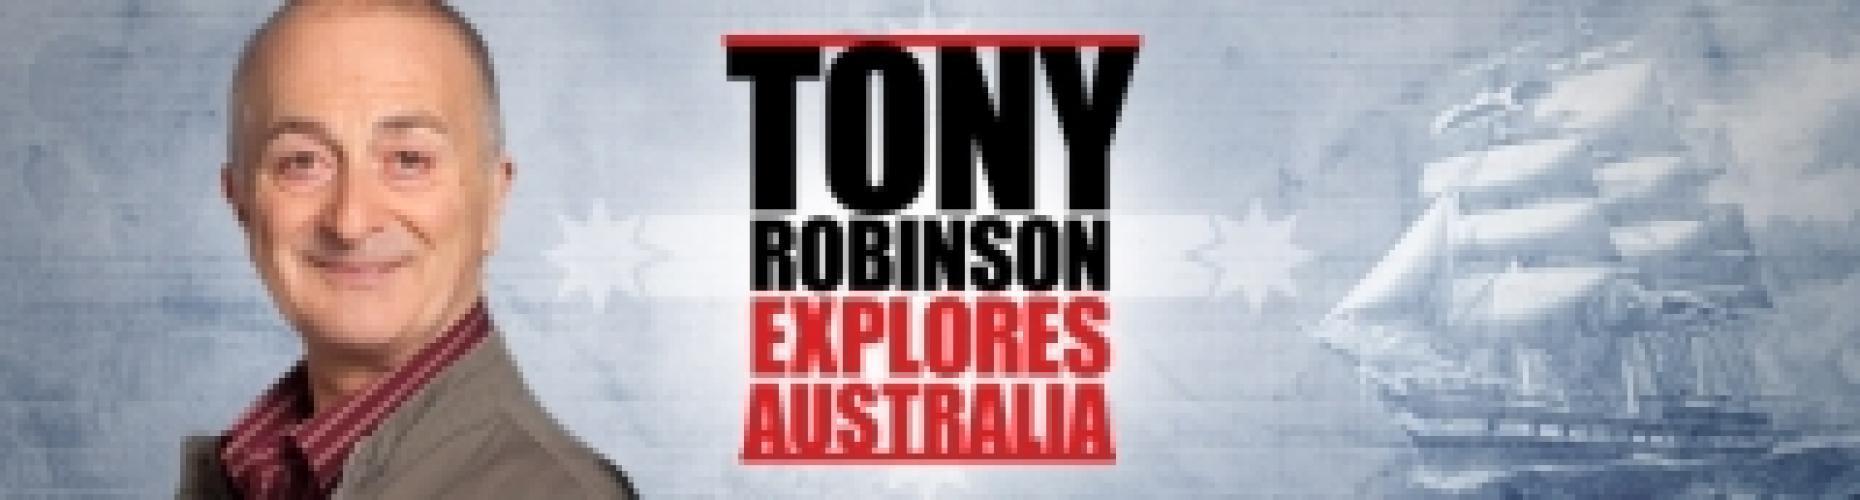 Tony Robinson Explores Australia next episode air date poster